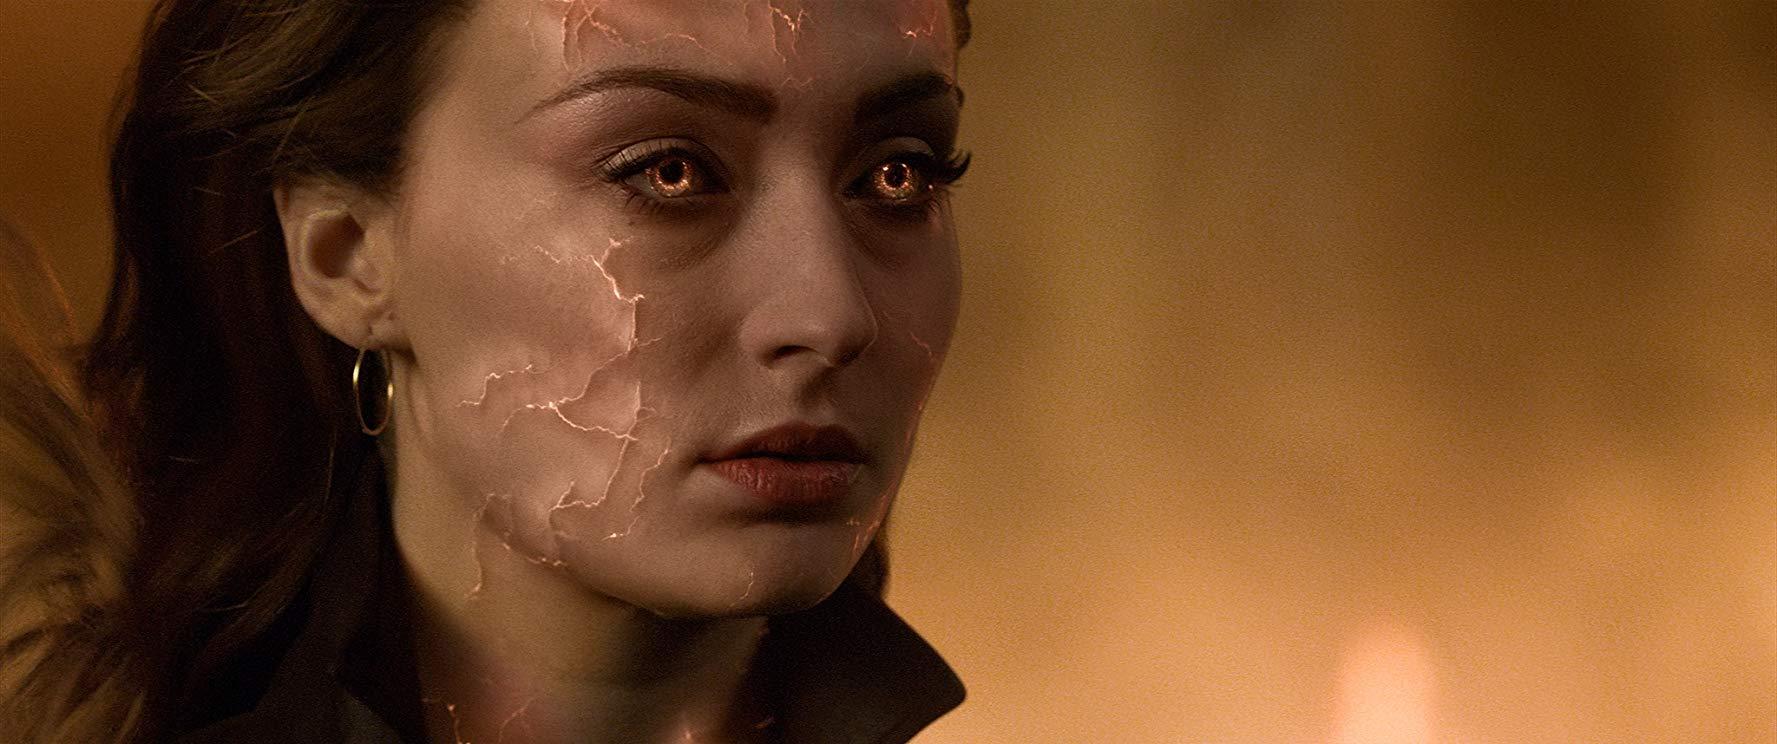 Watch The New Trailer For X-Men: Dark Phoenix